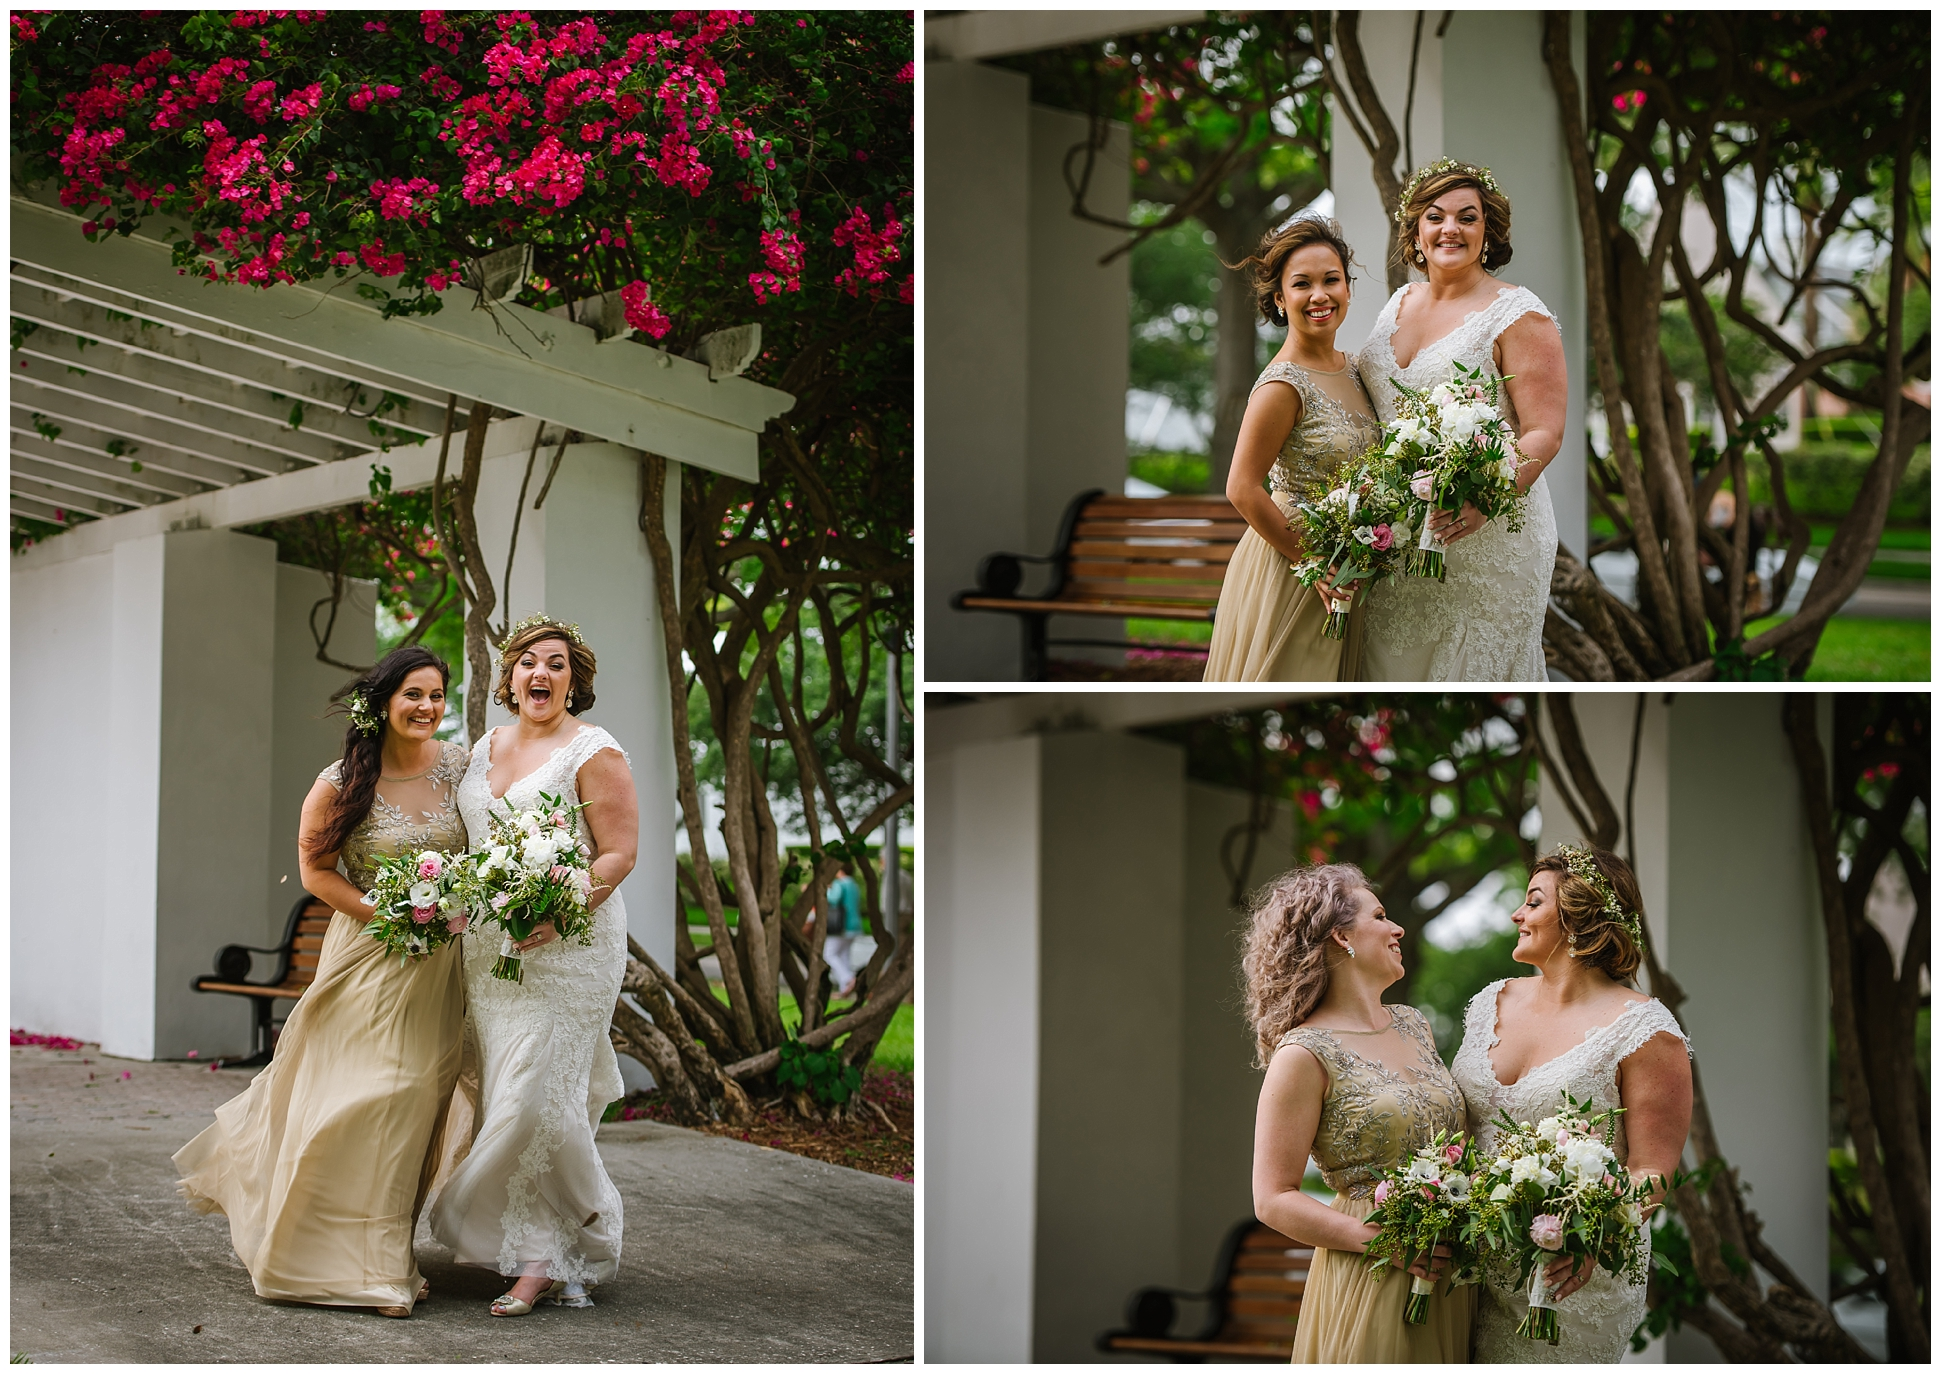 st-pete-wedding-photographer-italian-romance-theme-rustic-flower-crown_0422.jpg